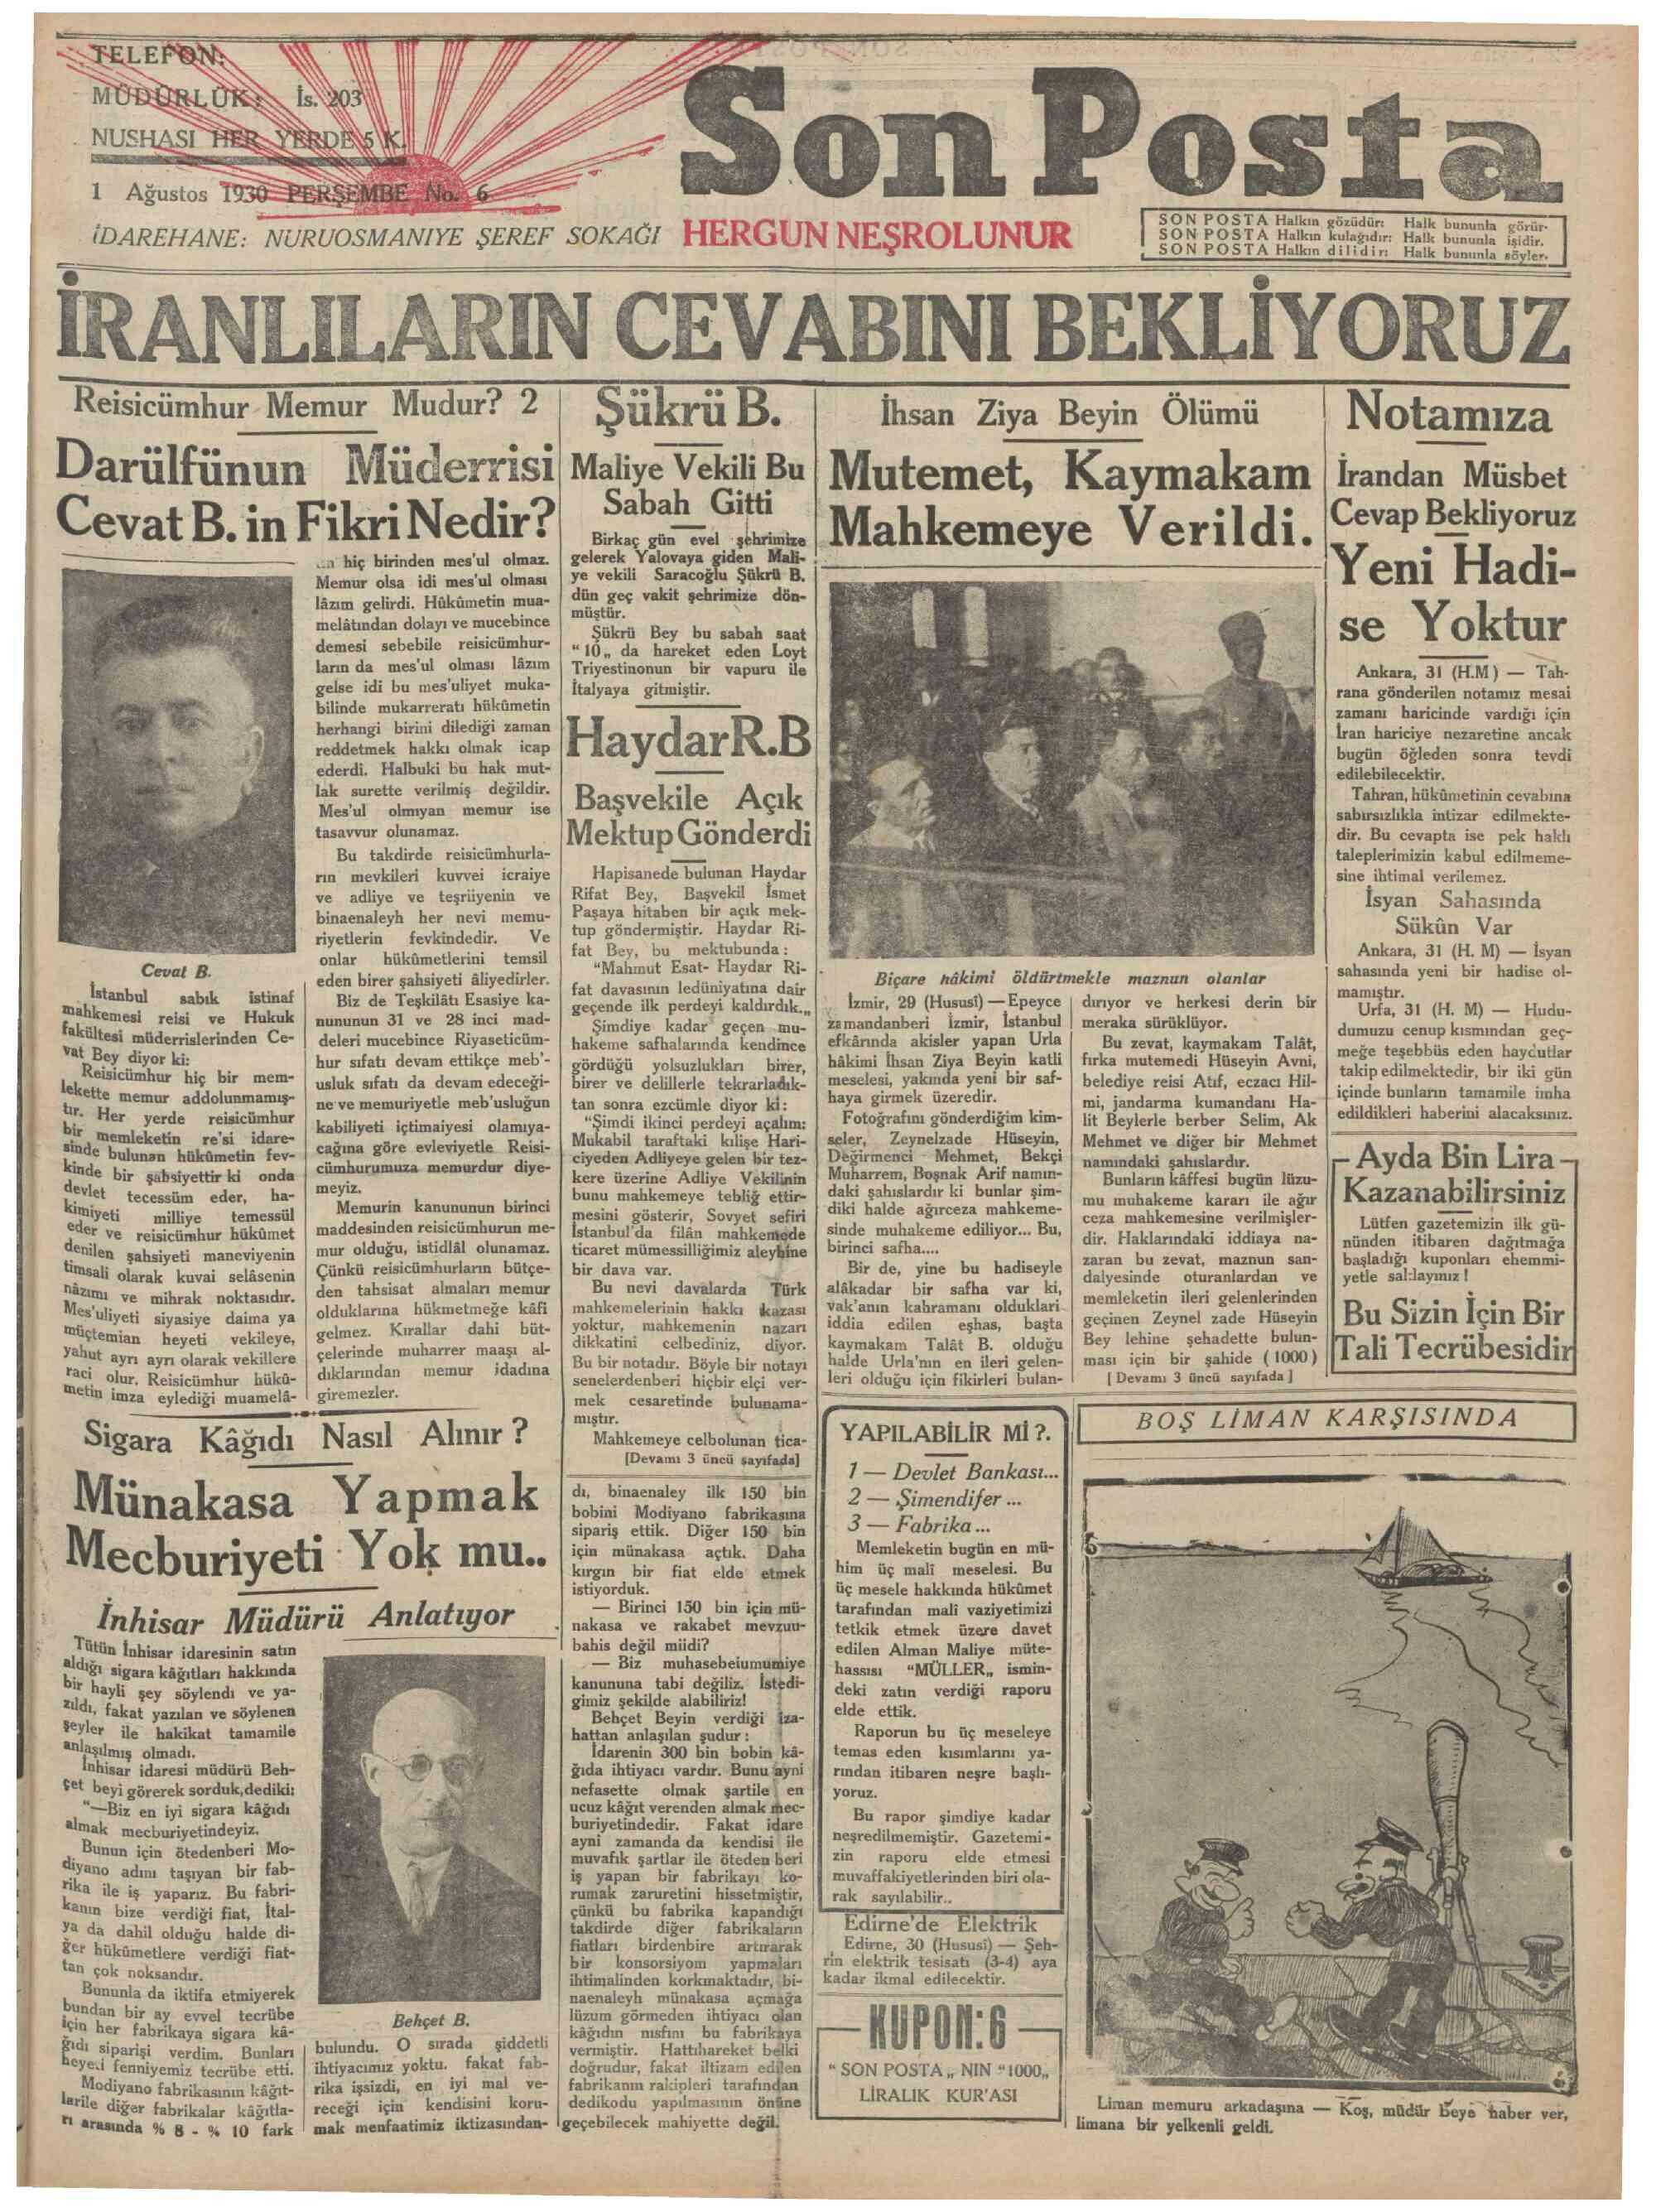 1 Ağustos 1930 Tarihli Son Posta Gazetesi Sayfa 1